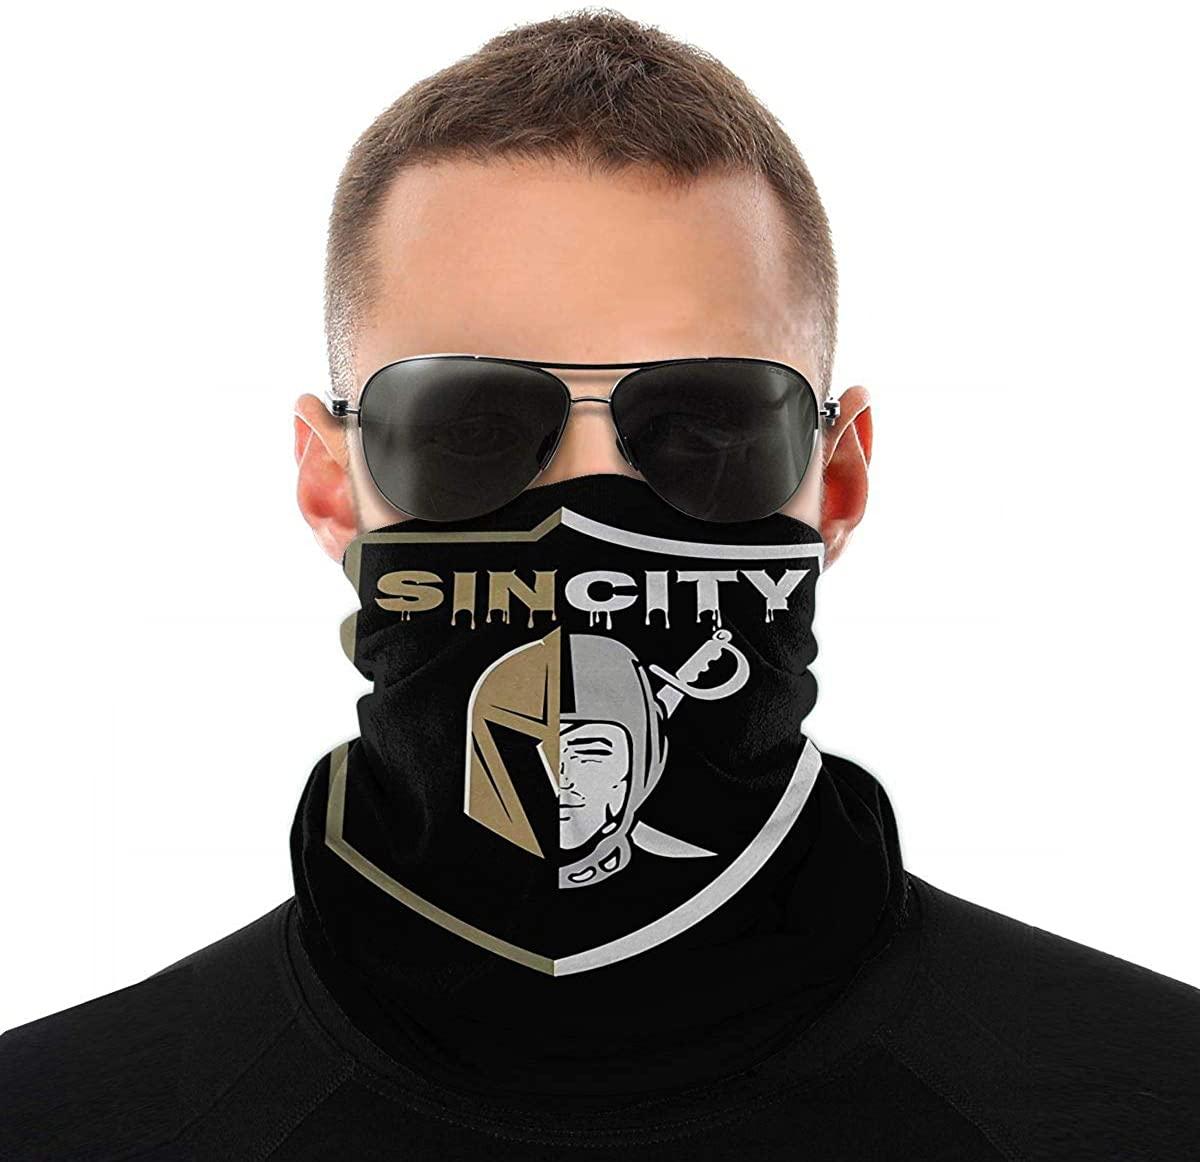 Sin City Las Vegas Raiders Golden Knights Fashionable Face Bandanas Sports & Casual Headwear Seamless Neck Gaiter, Headwrap